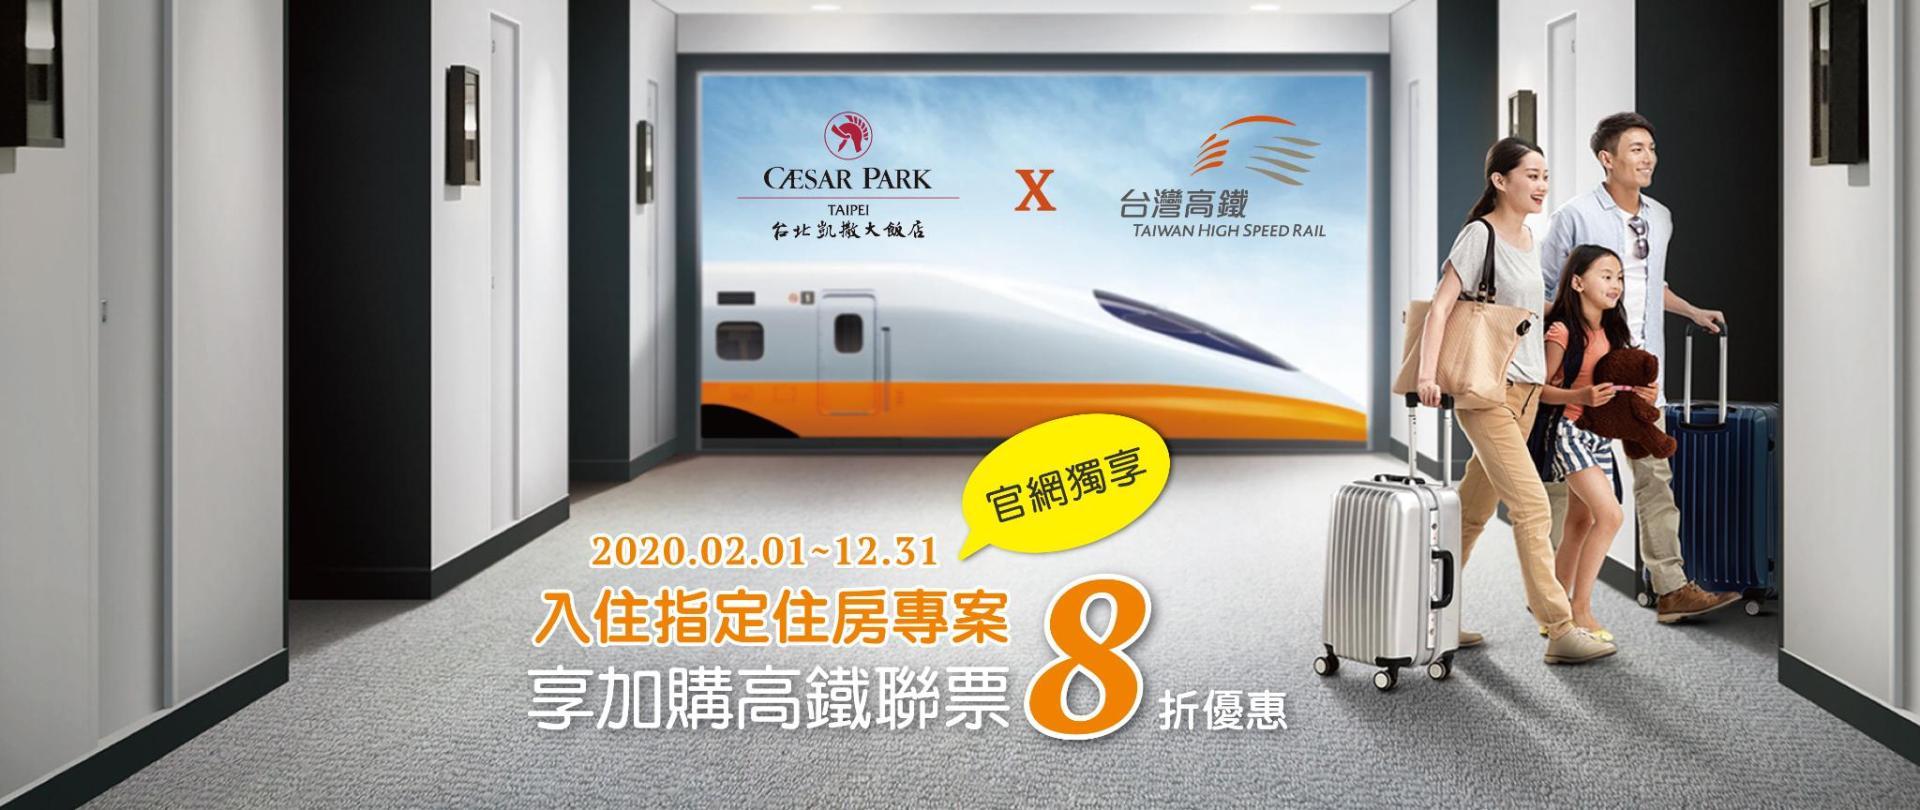 Slide Show1920X810_2020高鐵聯票-01.jpg